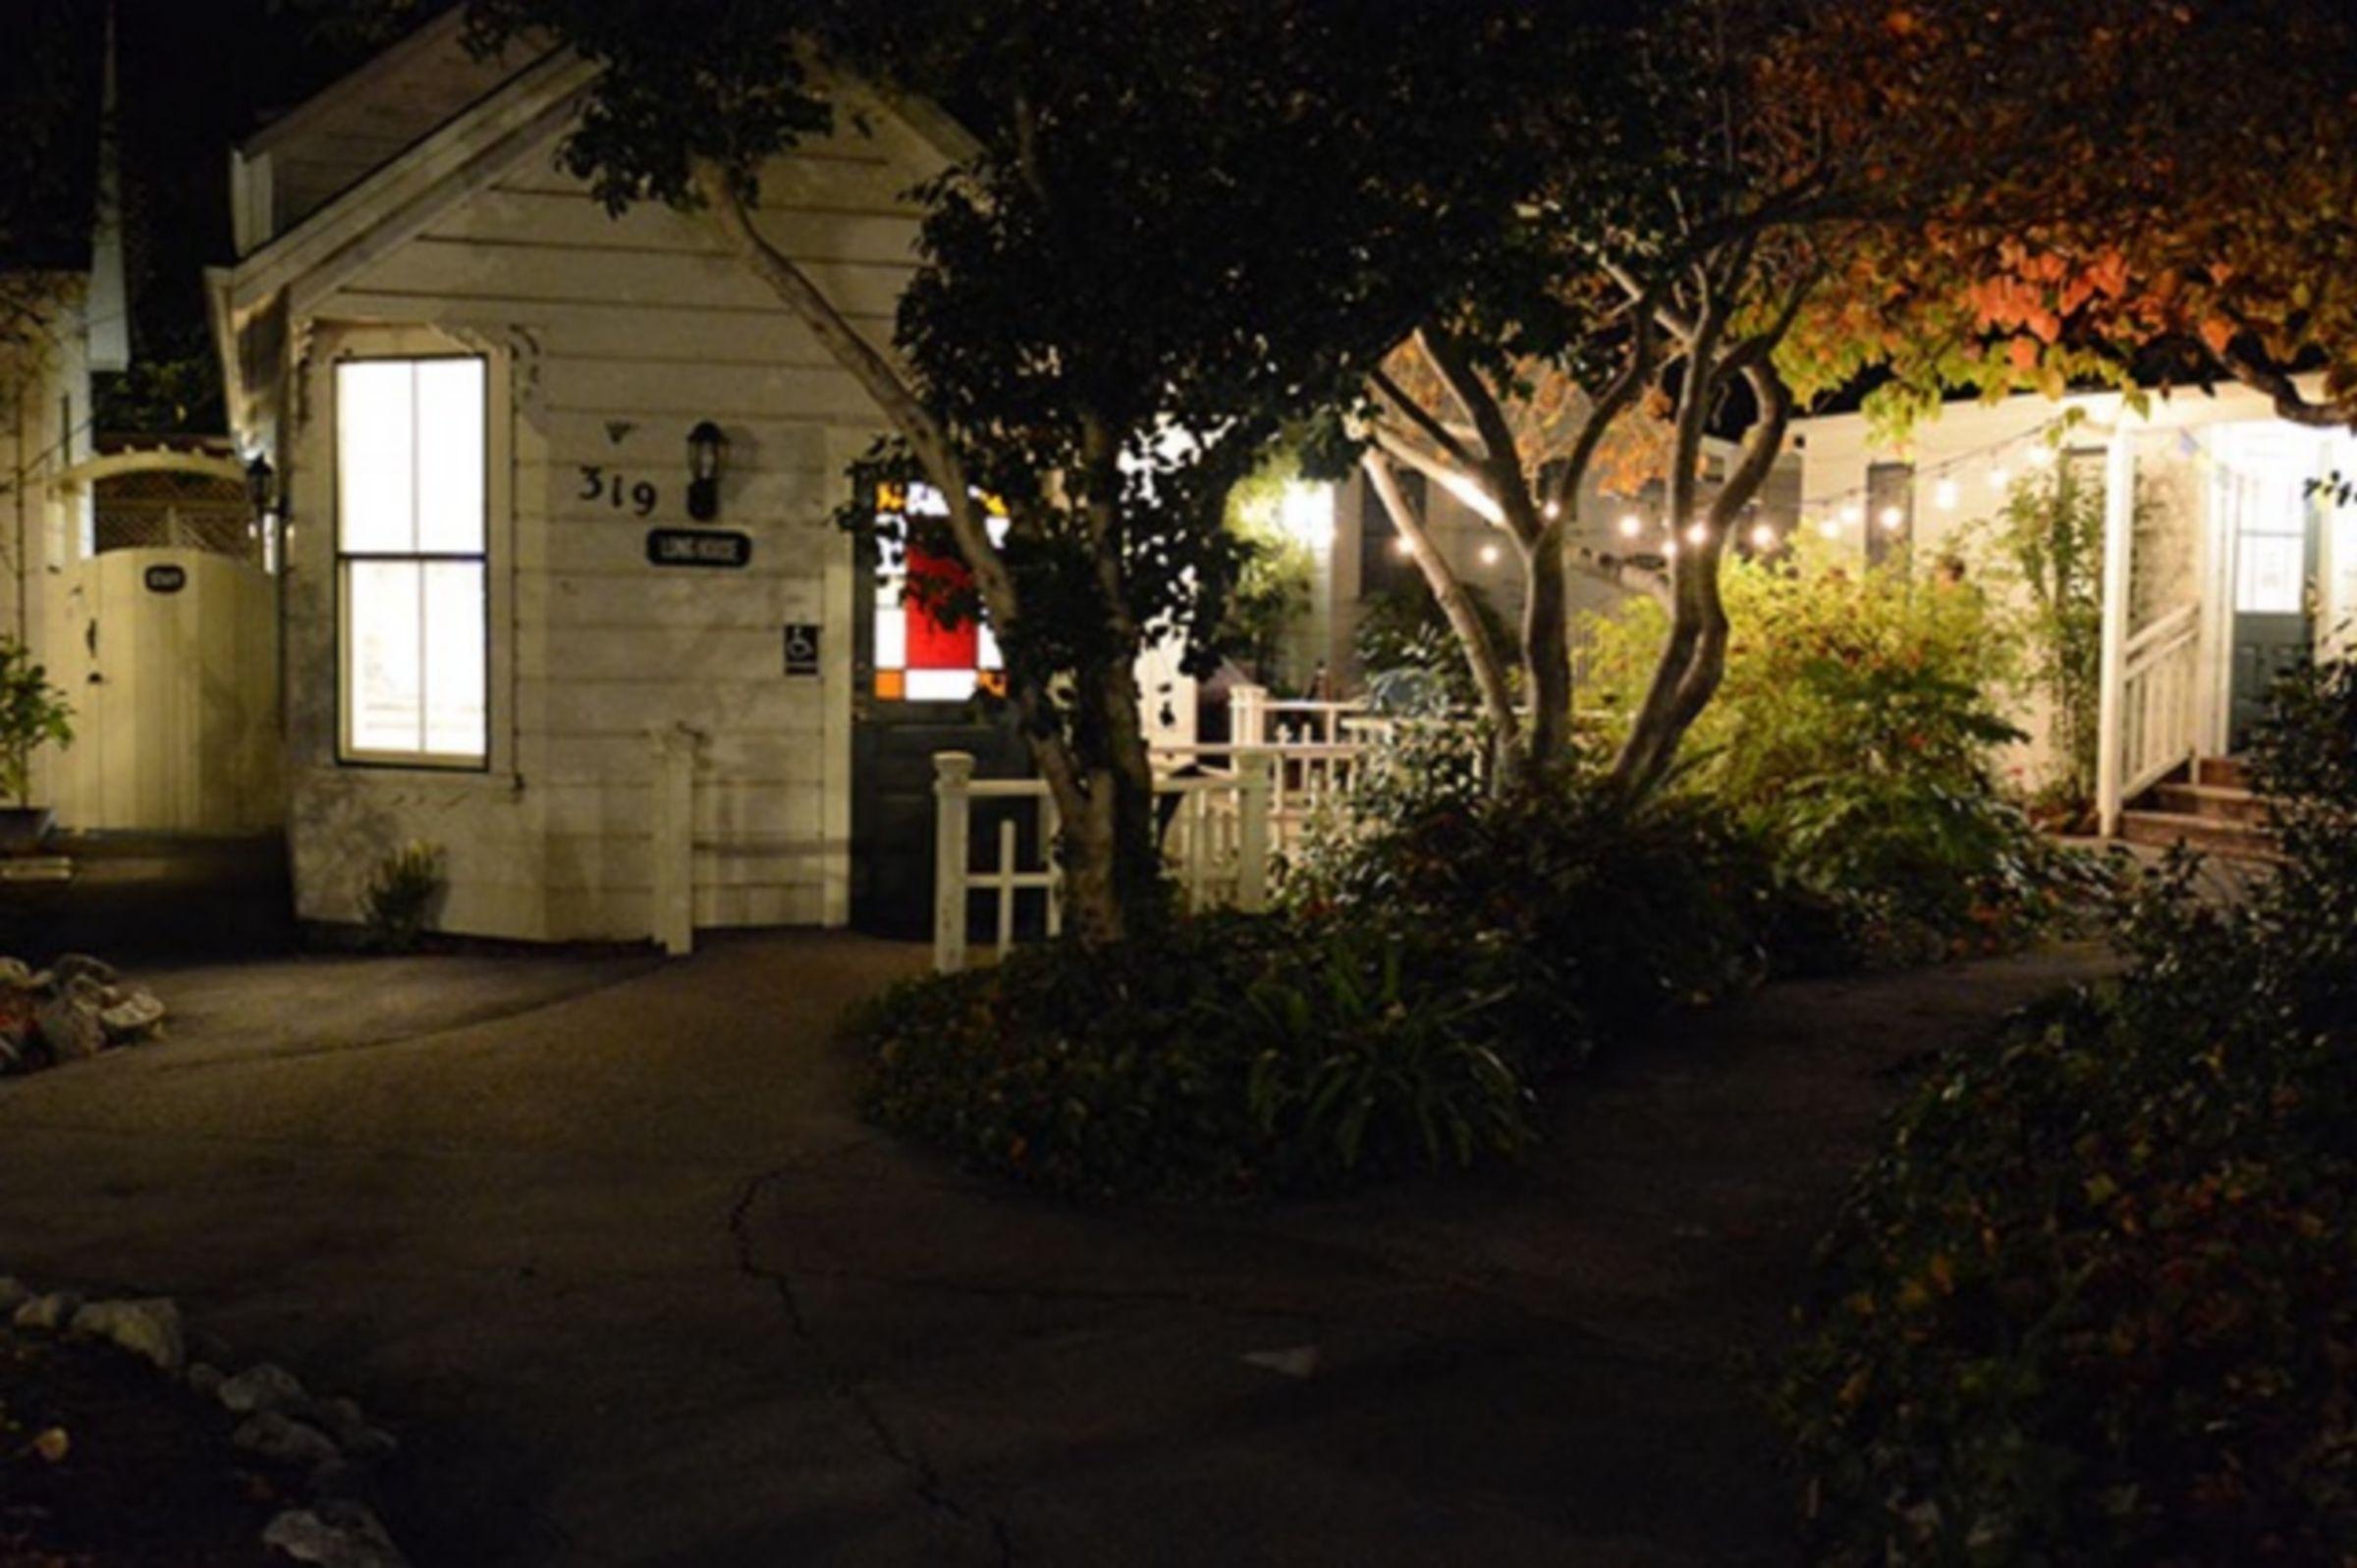 HI-Santa Cruz Hostel